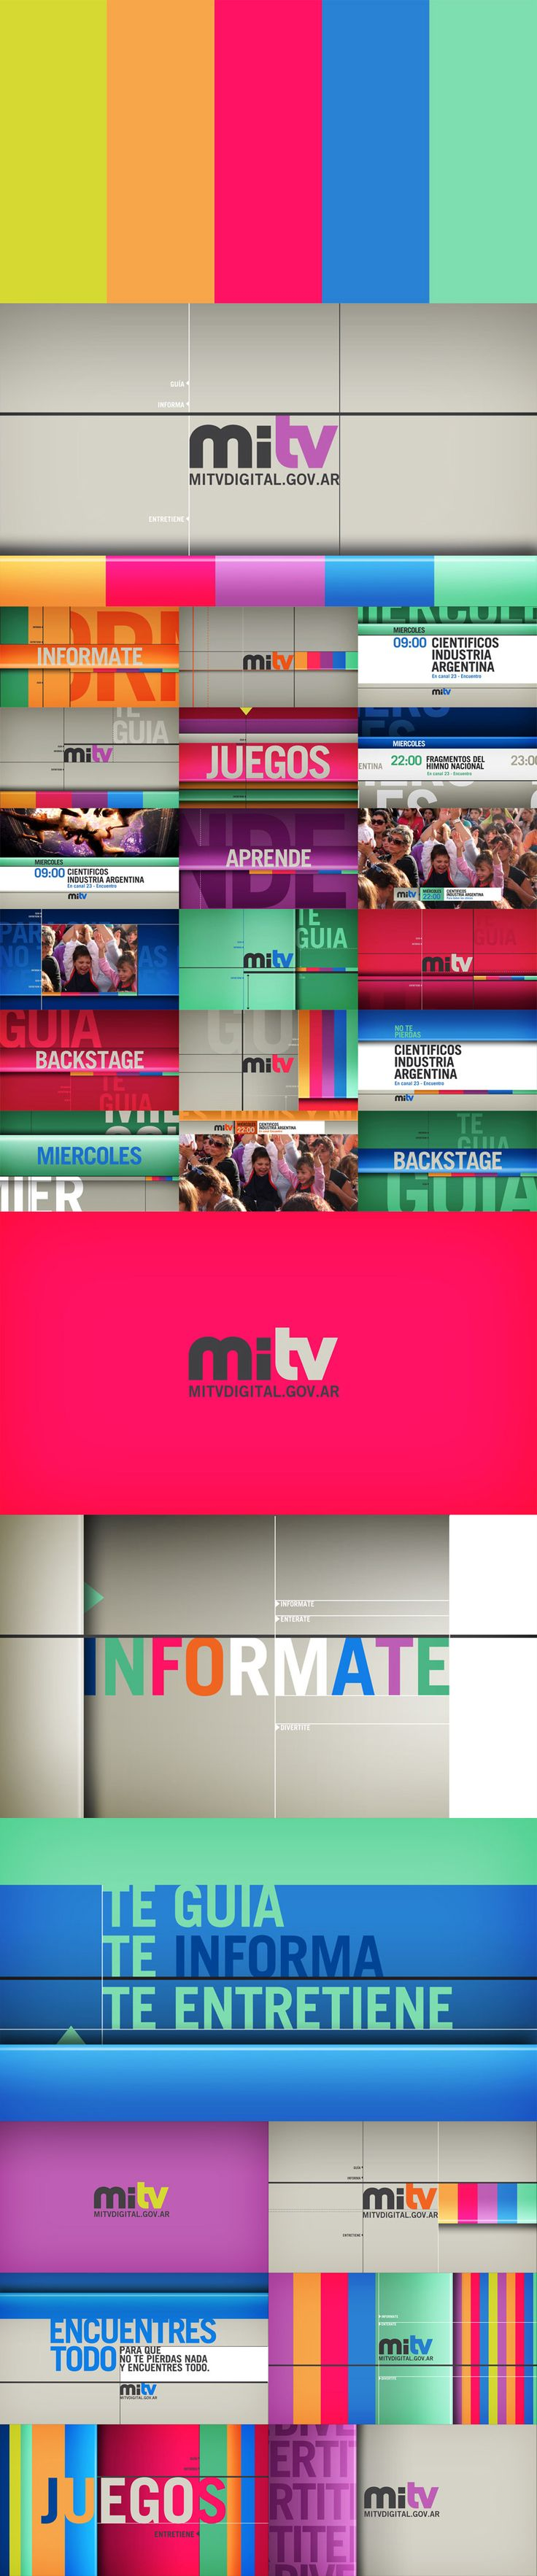 MiTv - Channel Branding Design & animation. PALIS. palis.com.ar